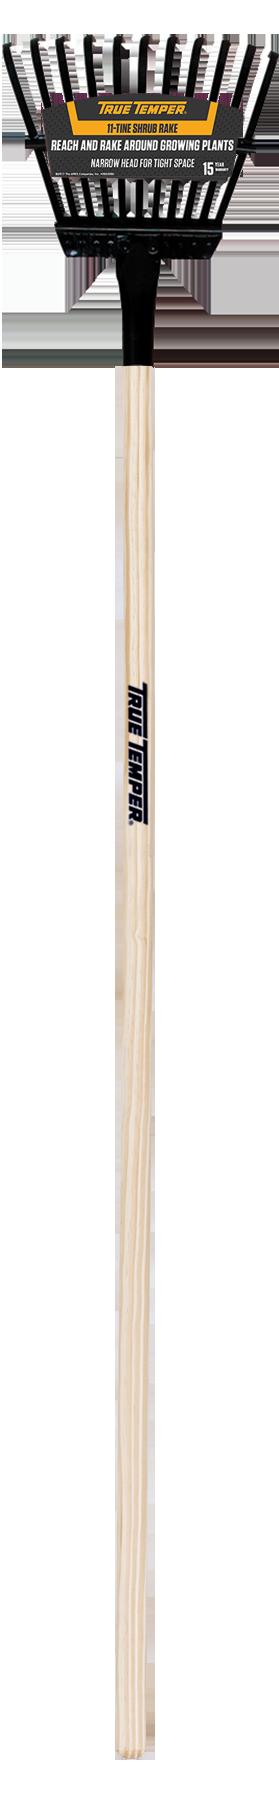 8 Inch Steel Tine Shrub Rake True Temper 174 Tools